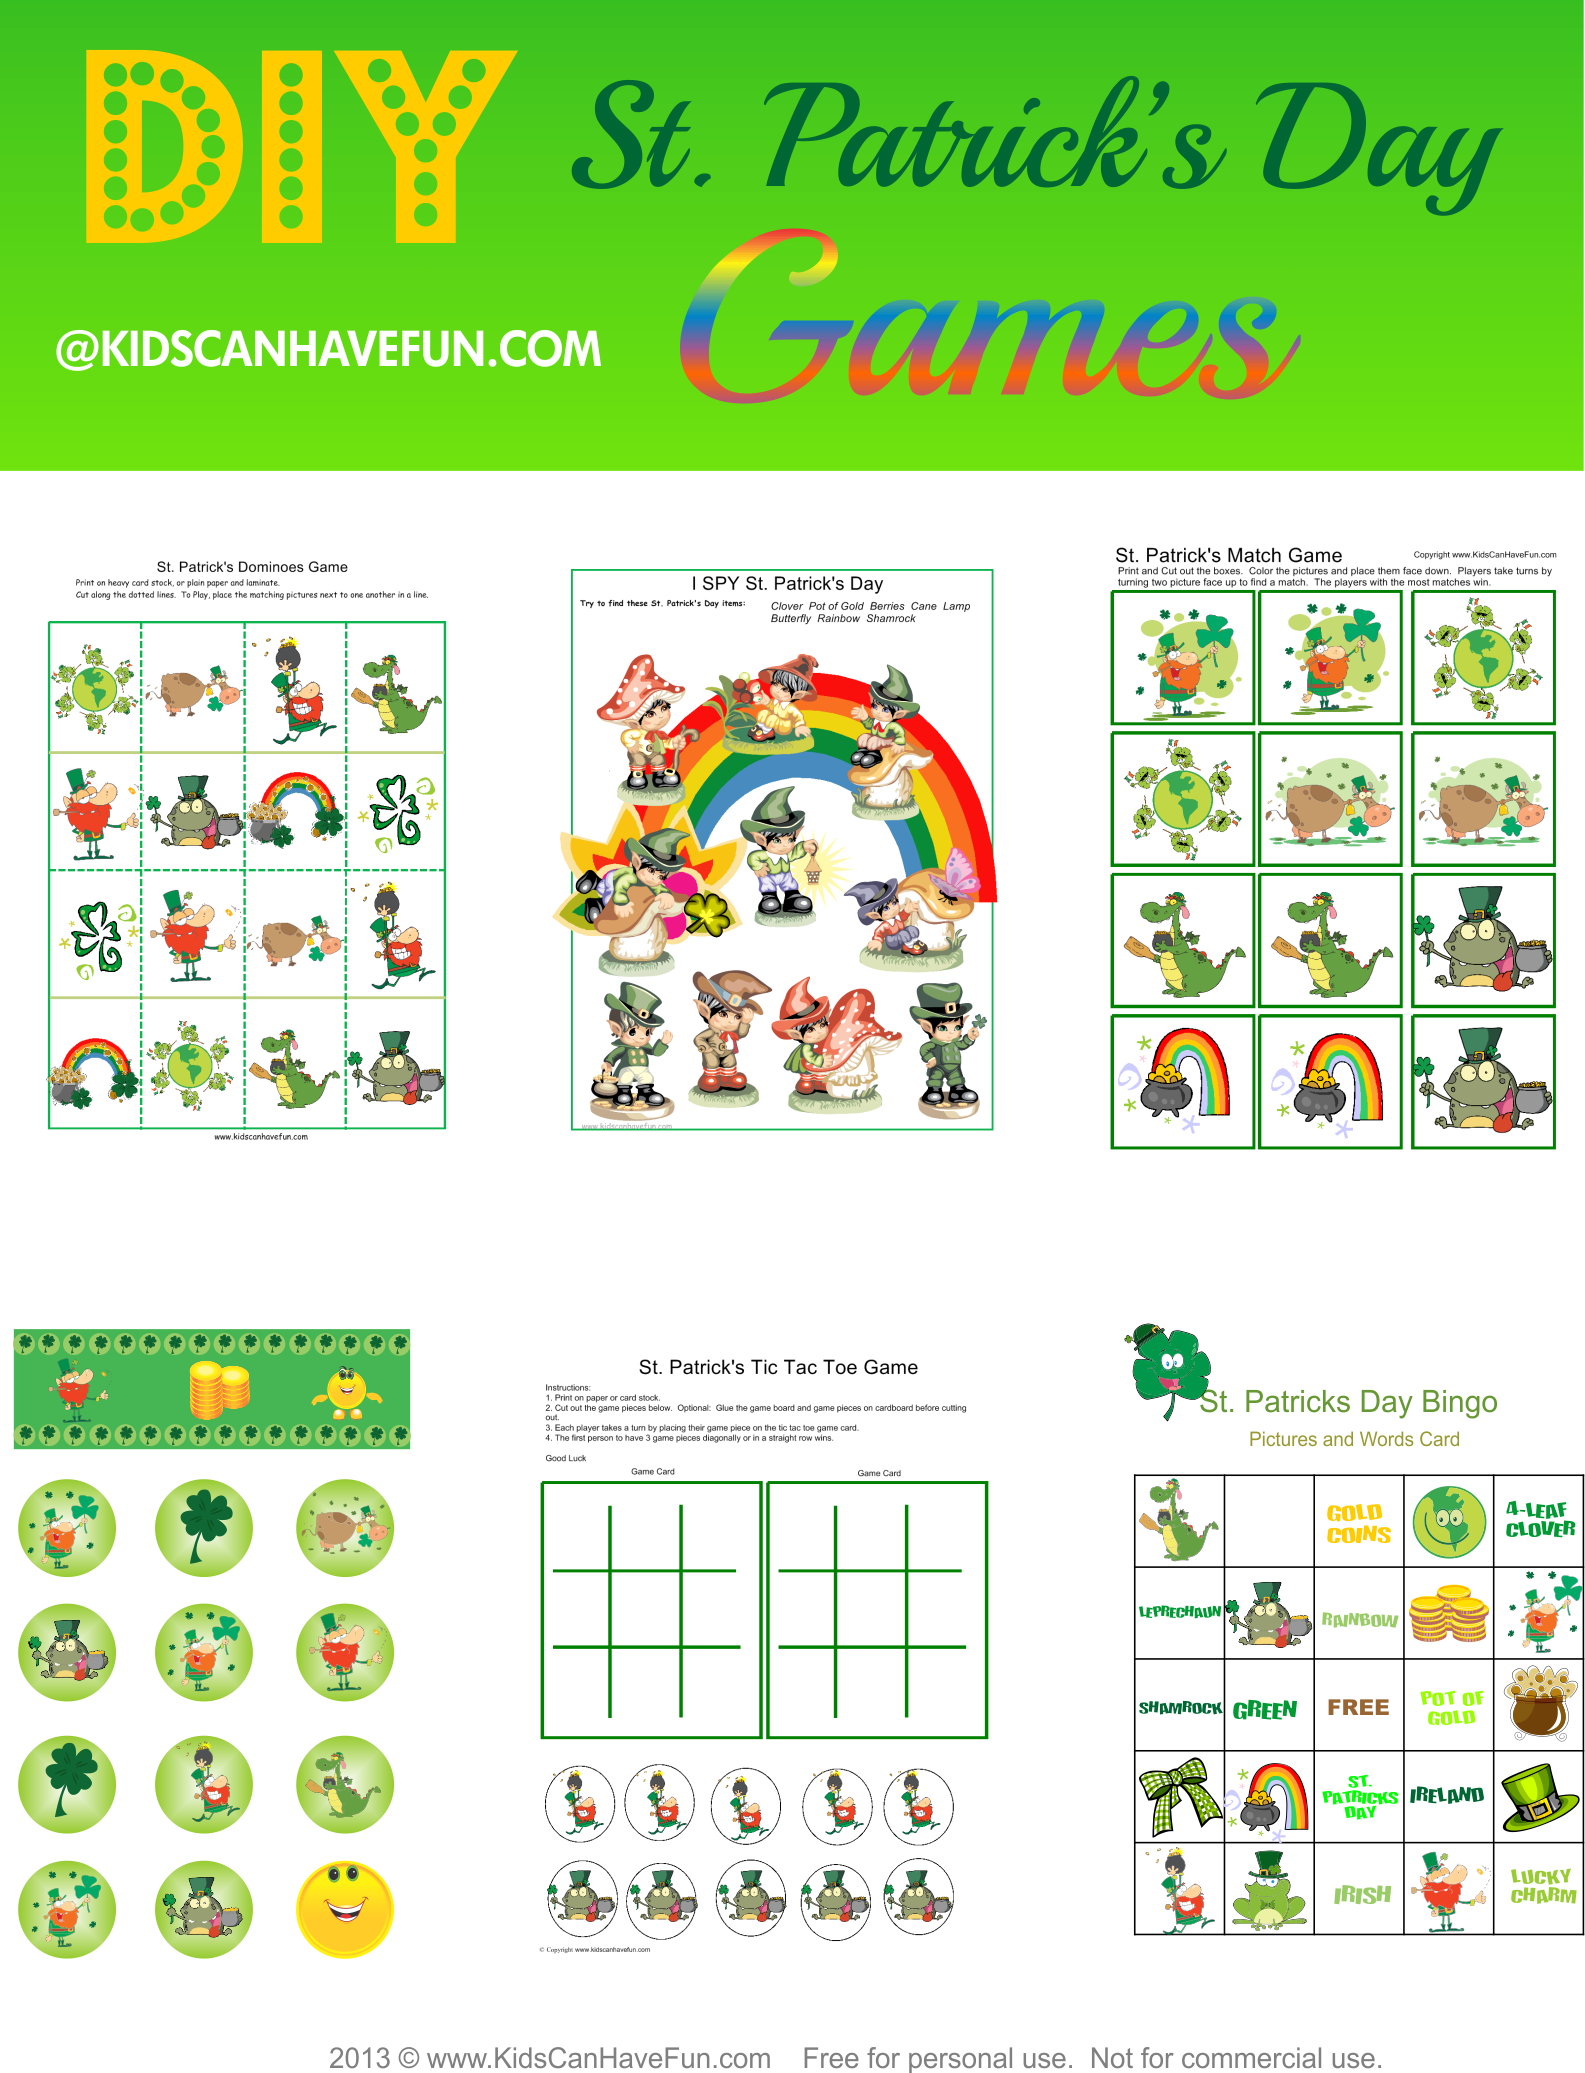 image about St Patrick's Day Bingo Printable known as St. Patricks Working day Game titles, I SPY Leprechaun, Inexperienced Bingo, Dominoes